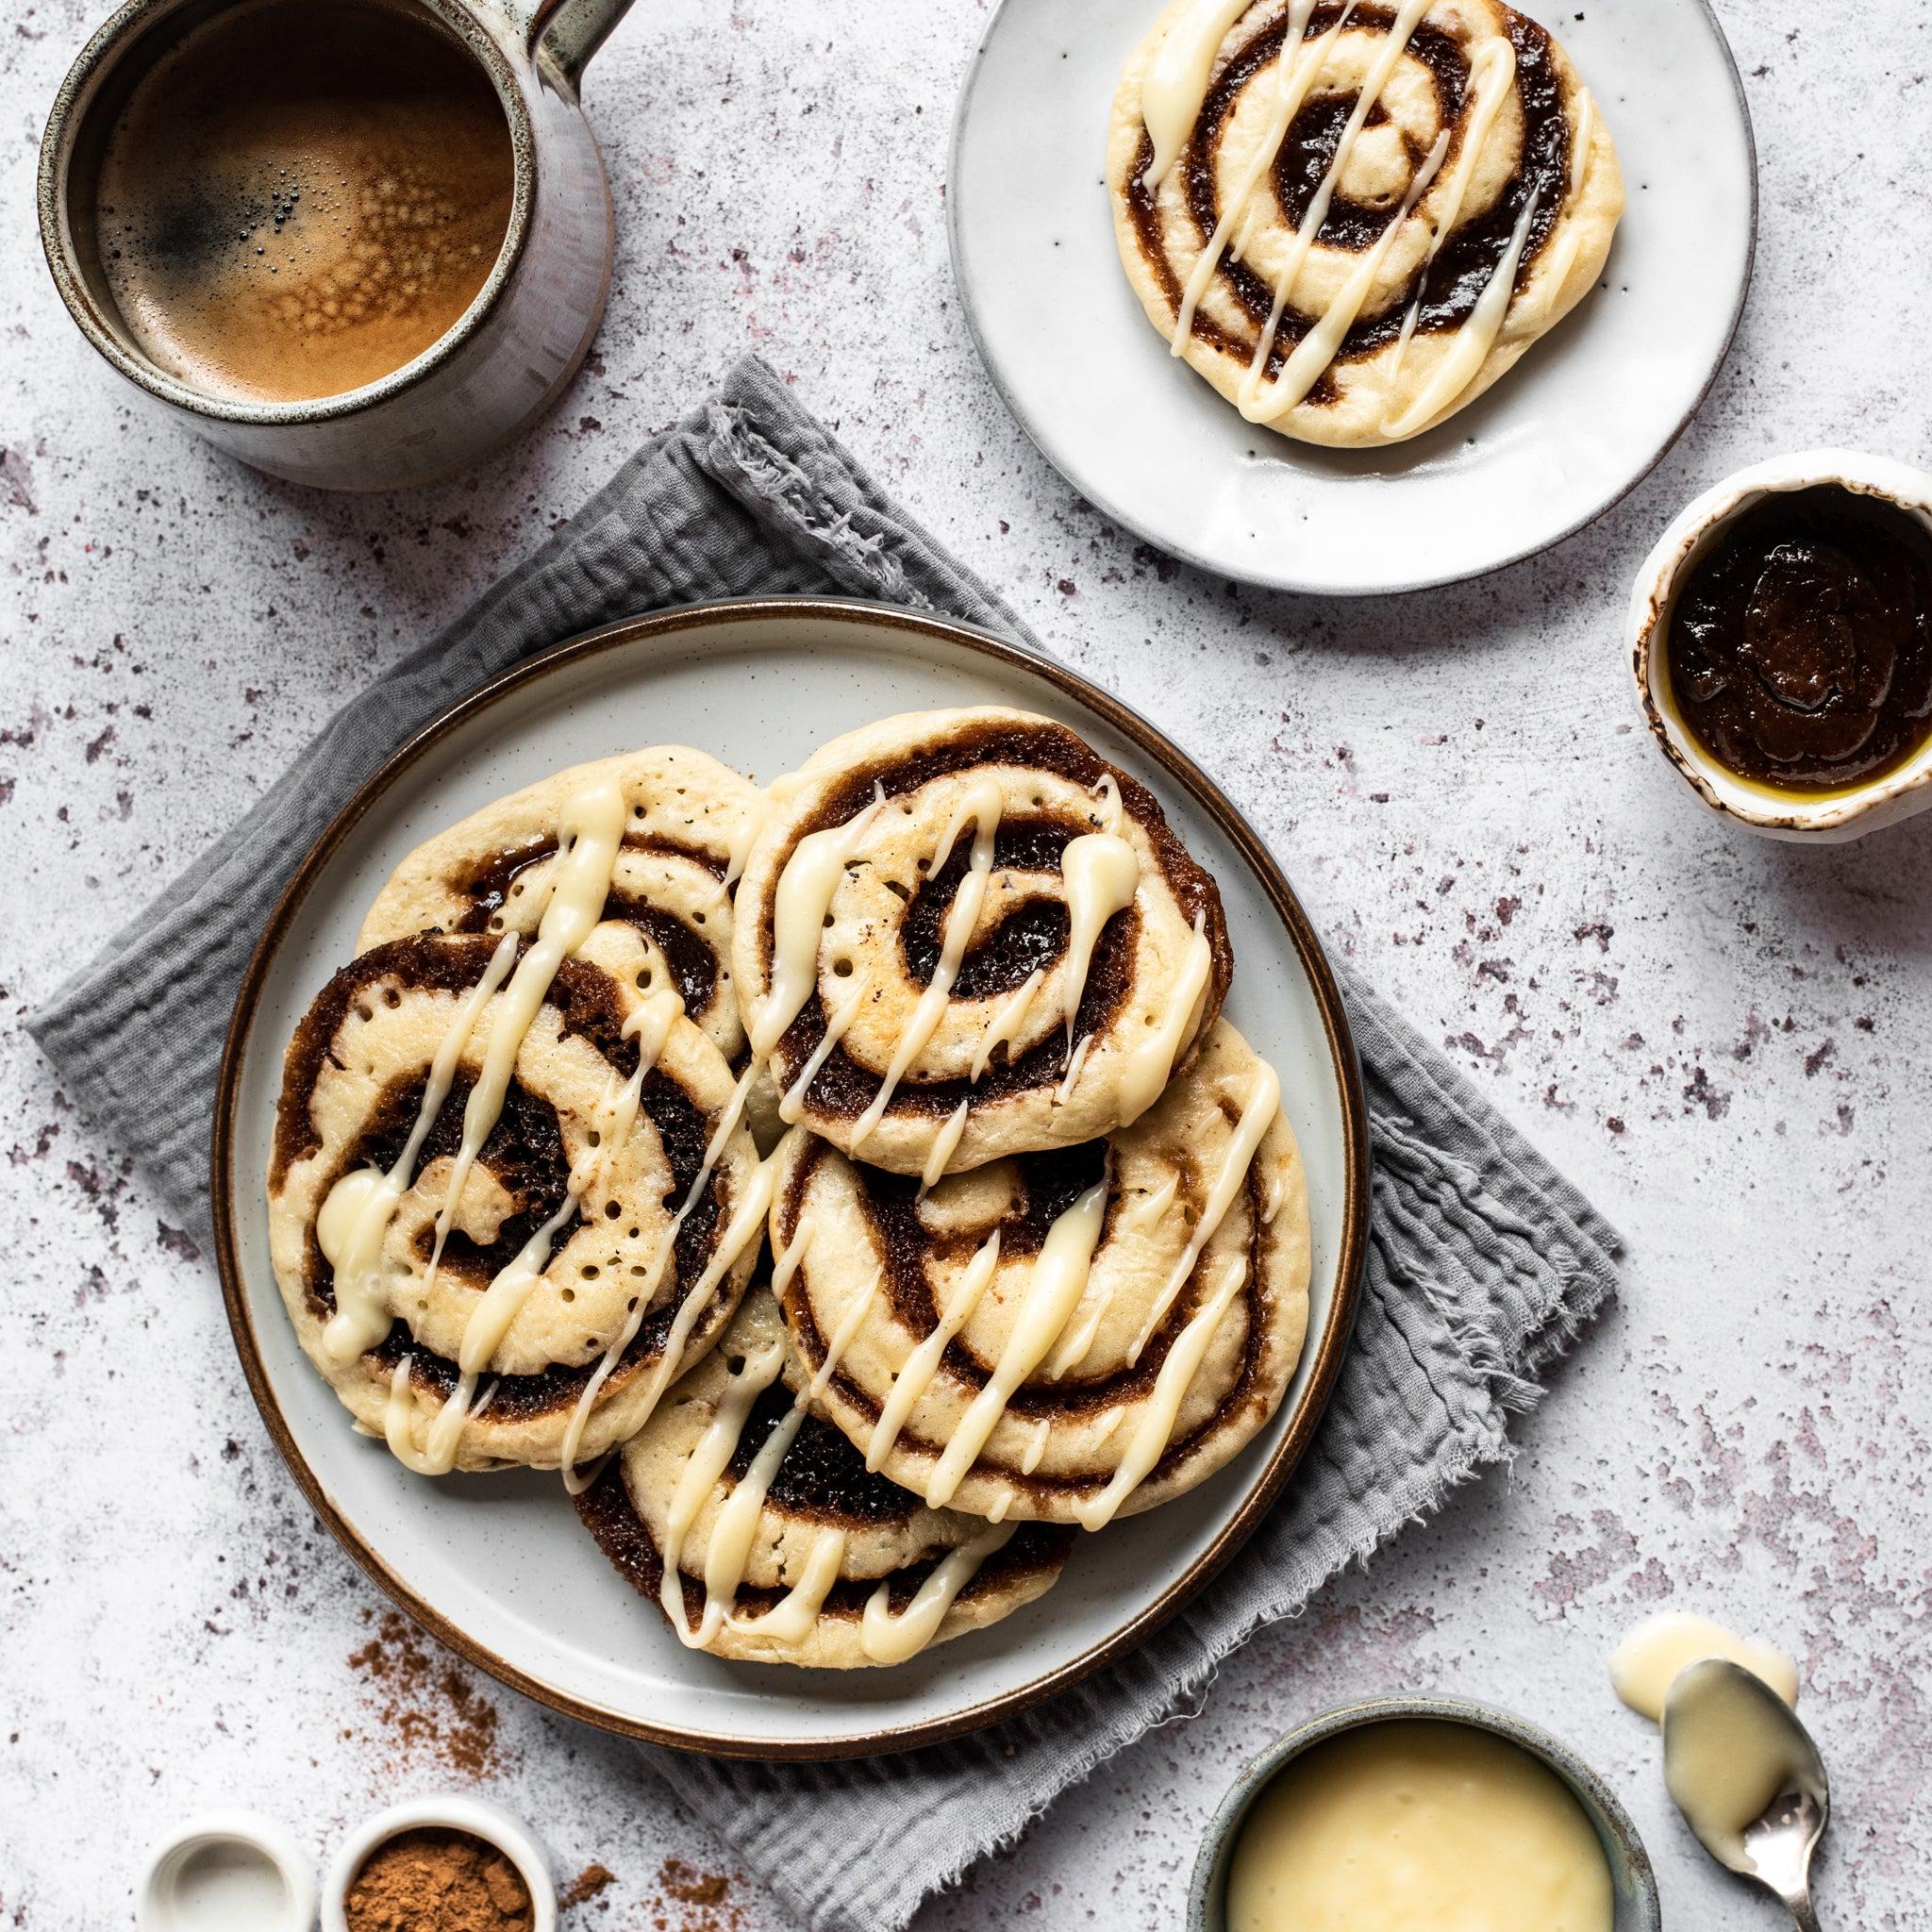 Cinnamon-Swirl-Pancakes-SQUARE-2.jpg